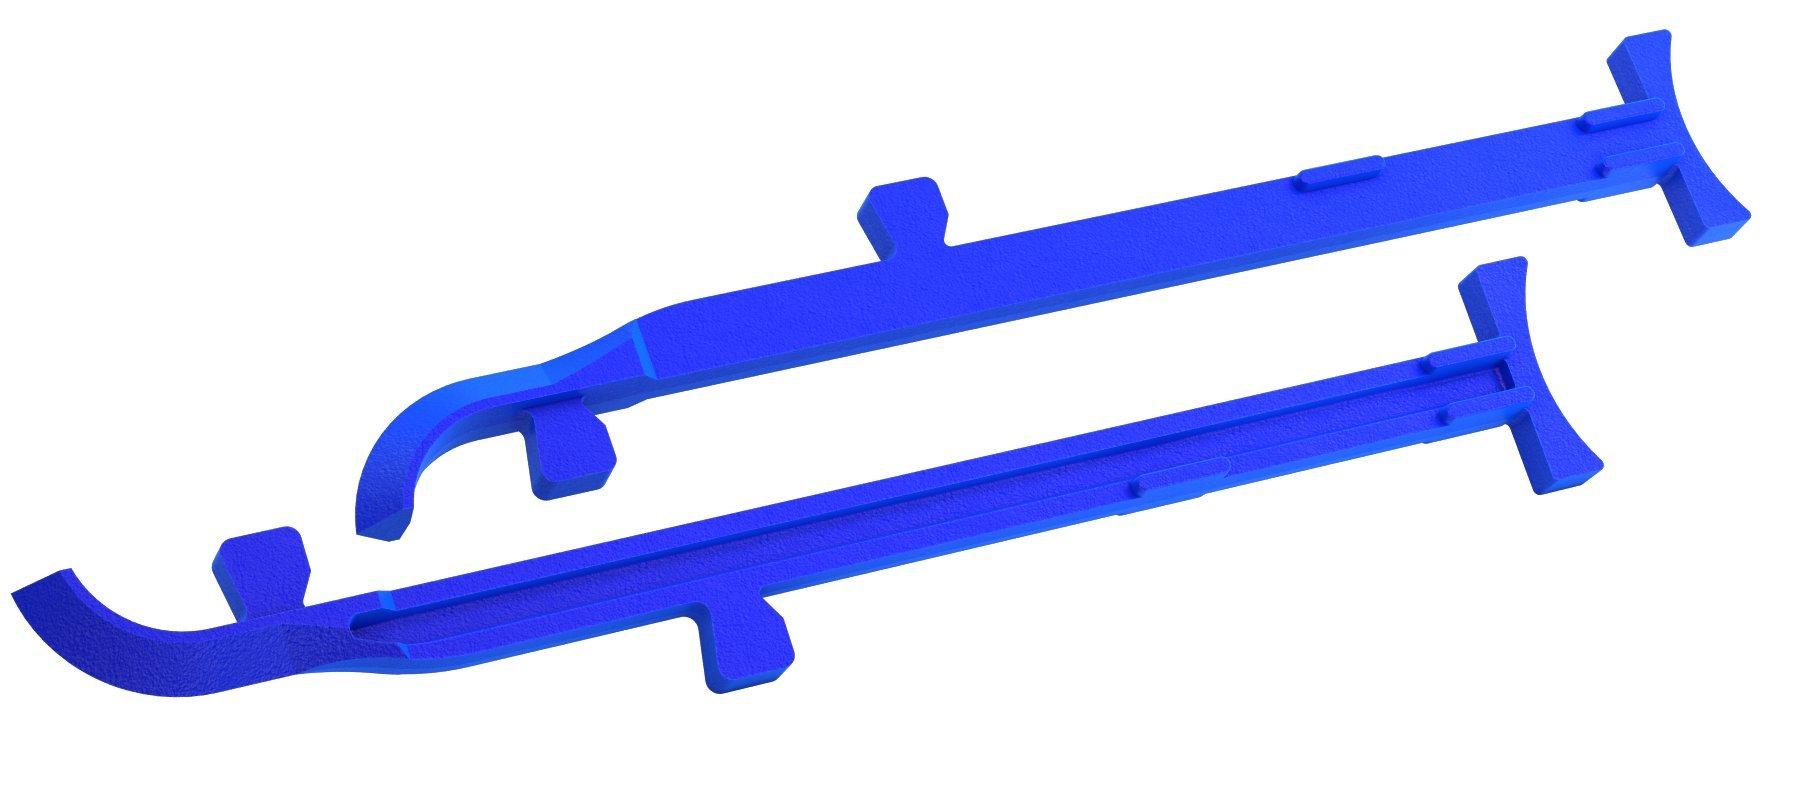 Bon 11-294 8-Inch to 12-Inch Cast Aluminum Line Stretchers, 1-Pair